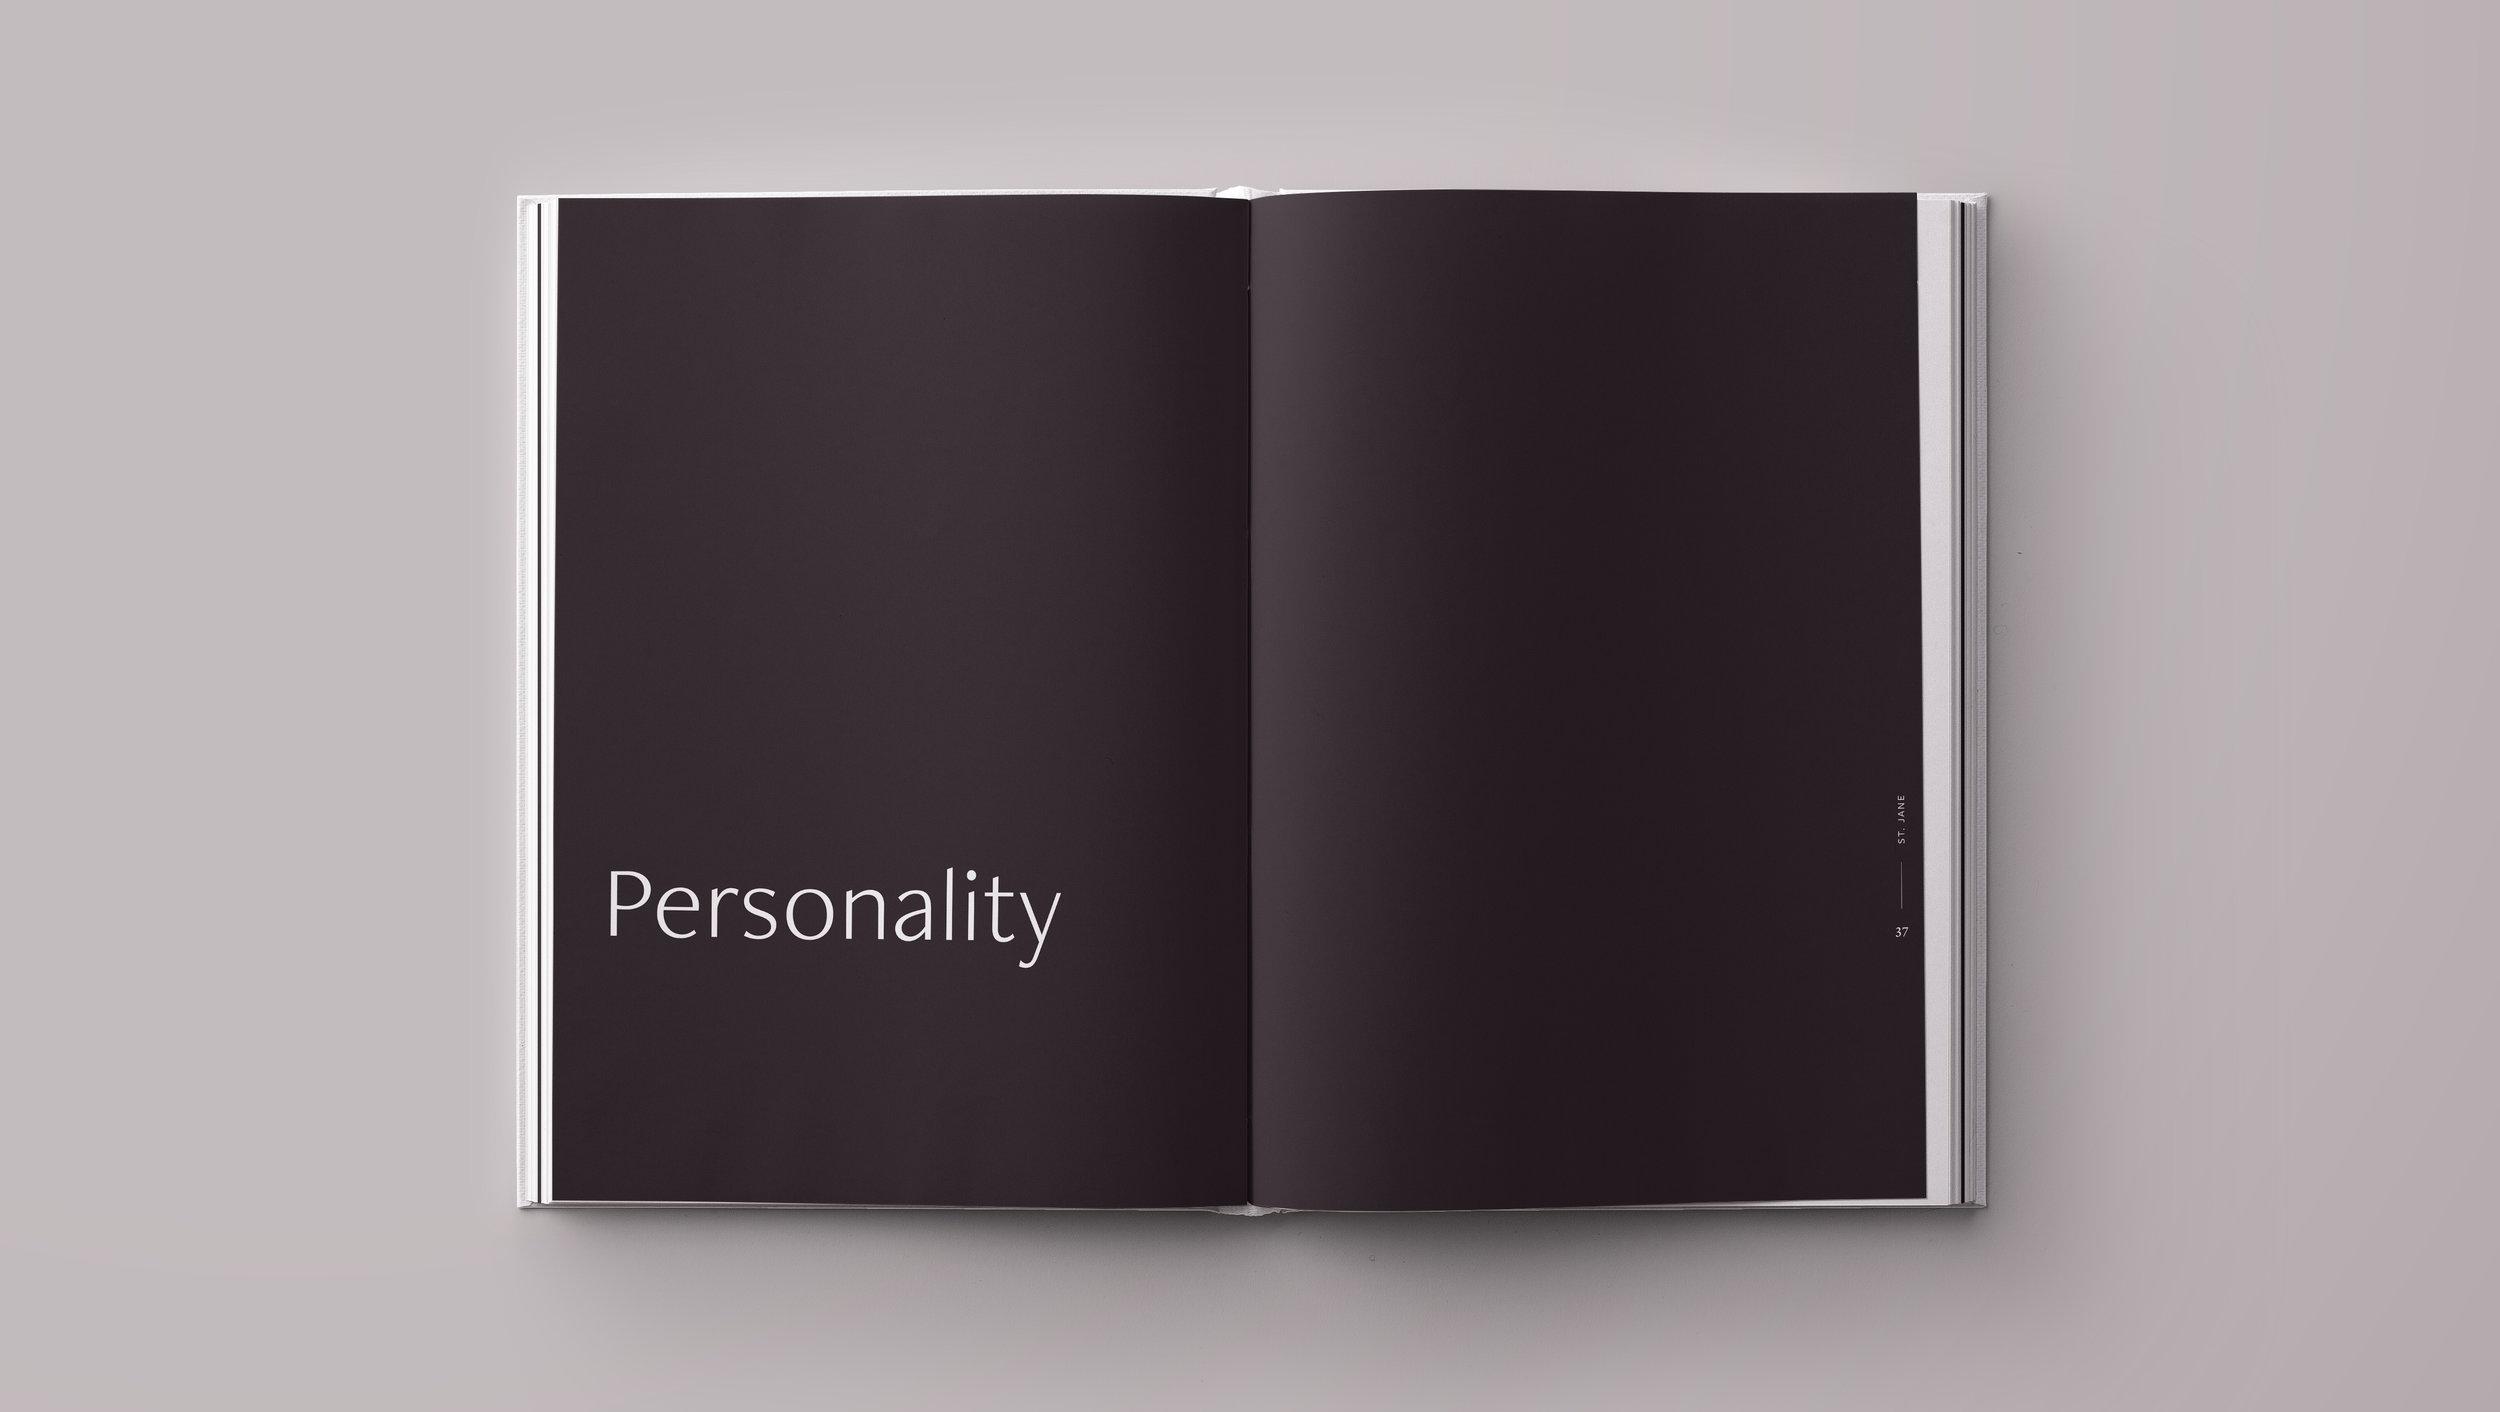 StJane_Book_0003_Personality.jpg